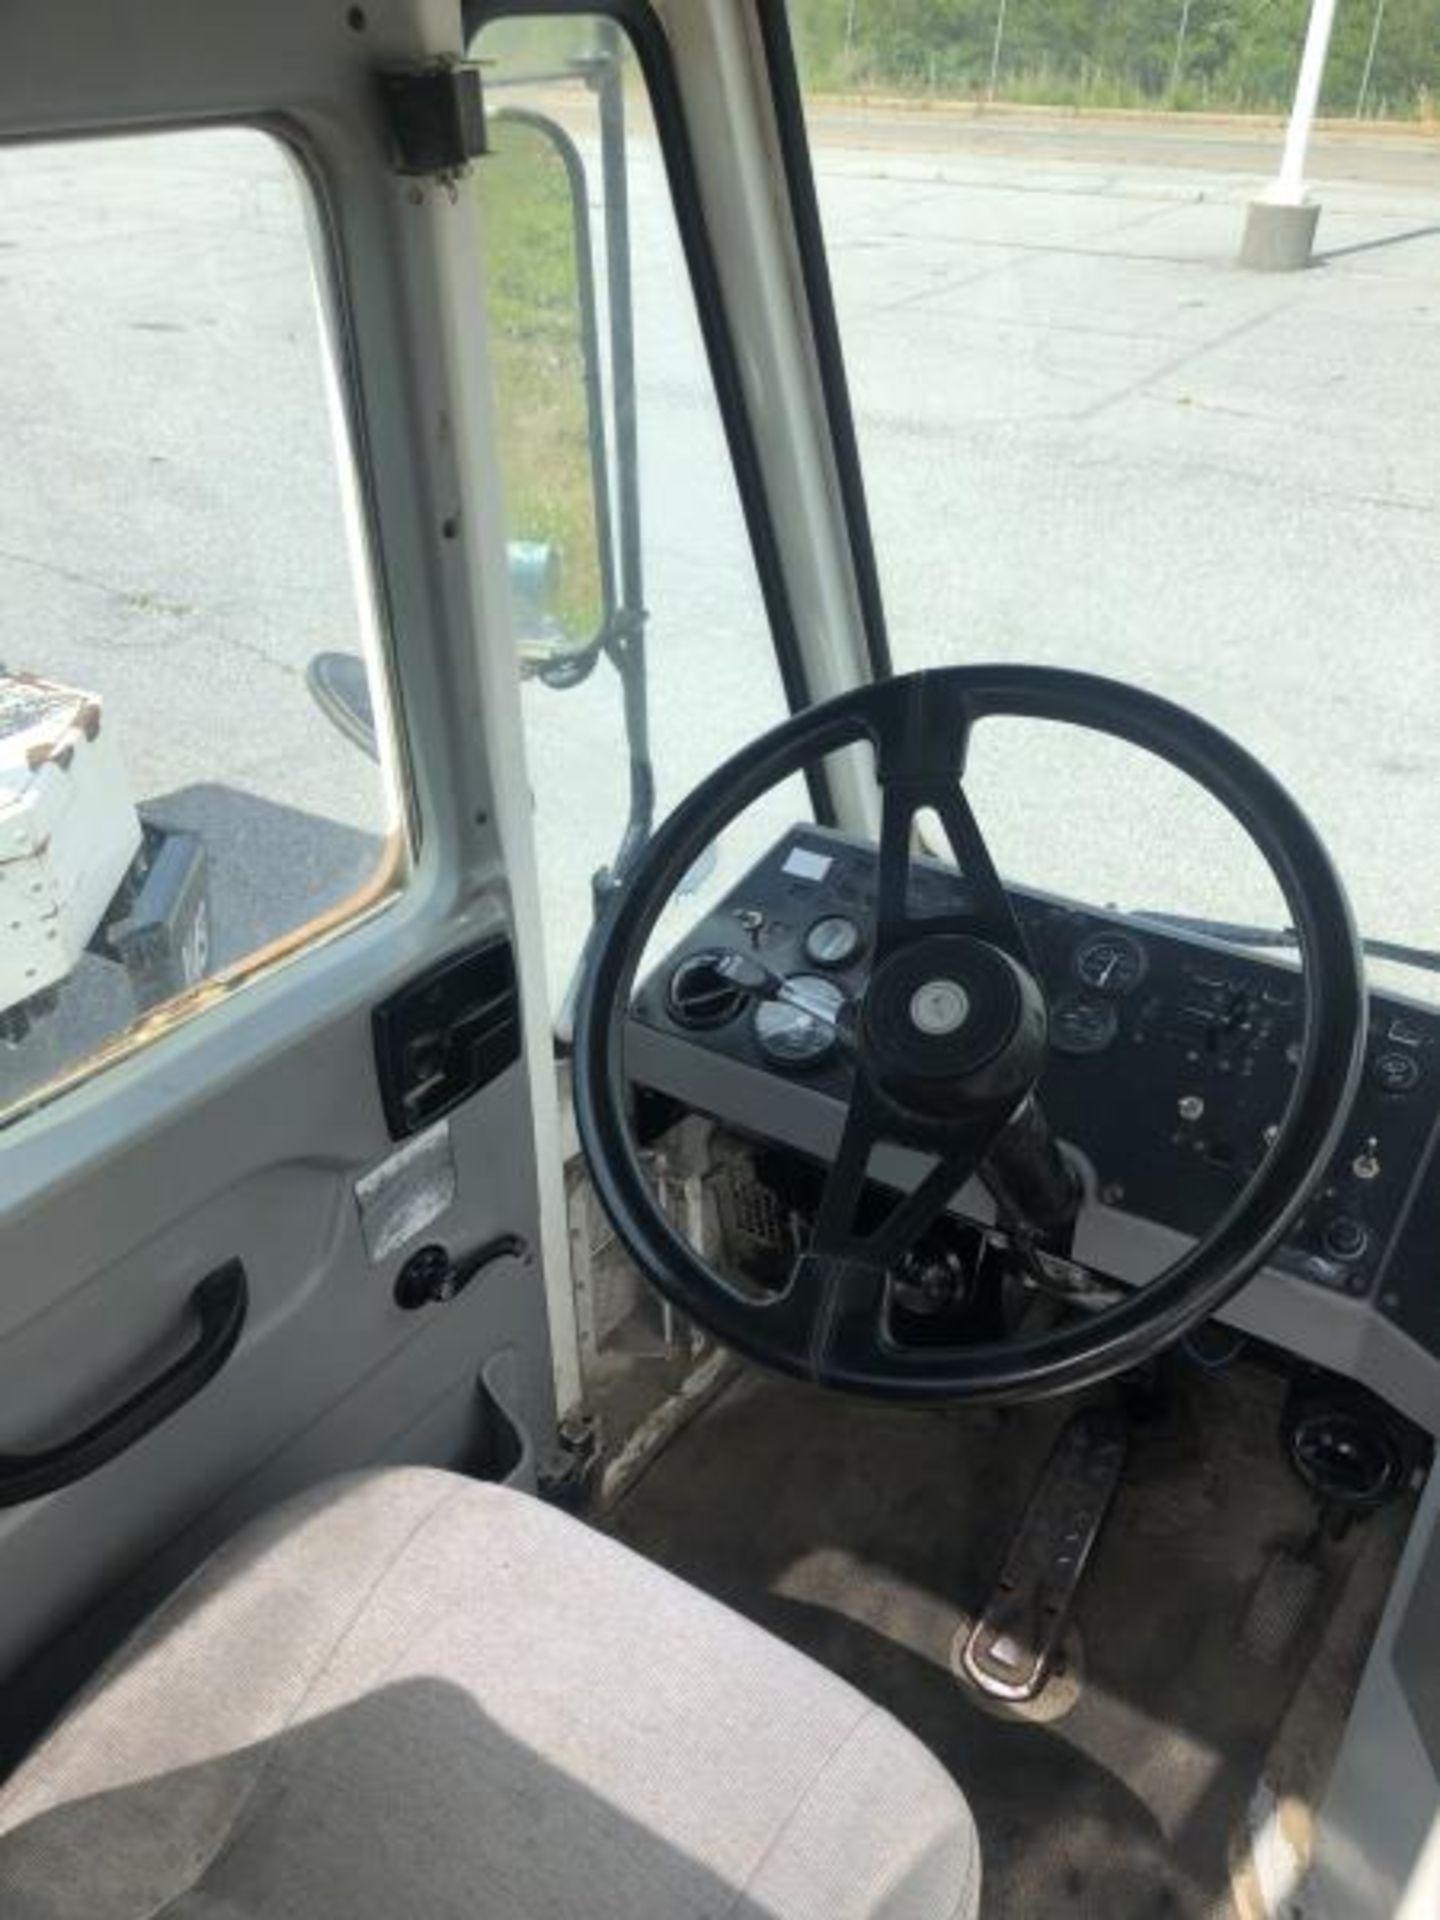 2015 Kalmar Ottawa 4x2 Yard Truck , SN: 338842 1,308.2 Hours, 937 Miles - Image 22 of 27